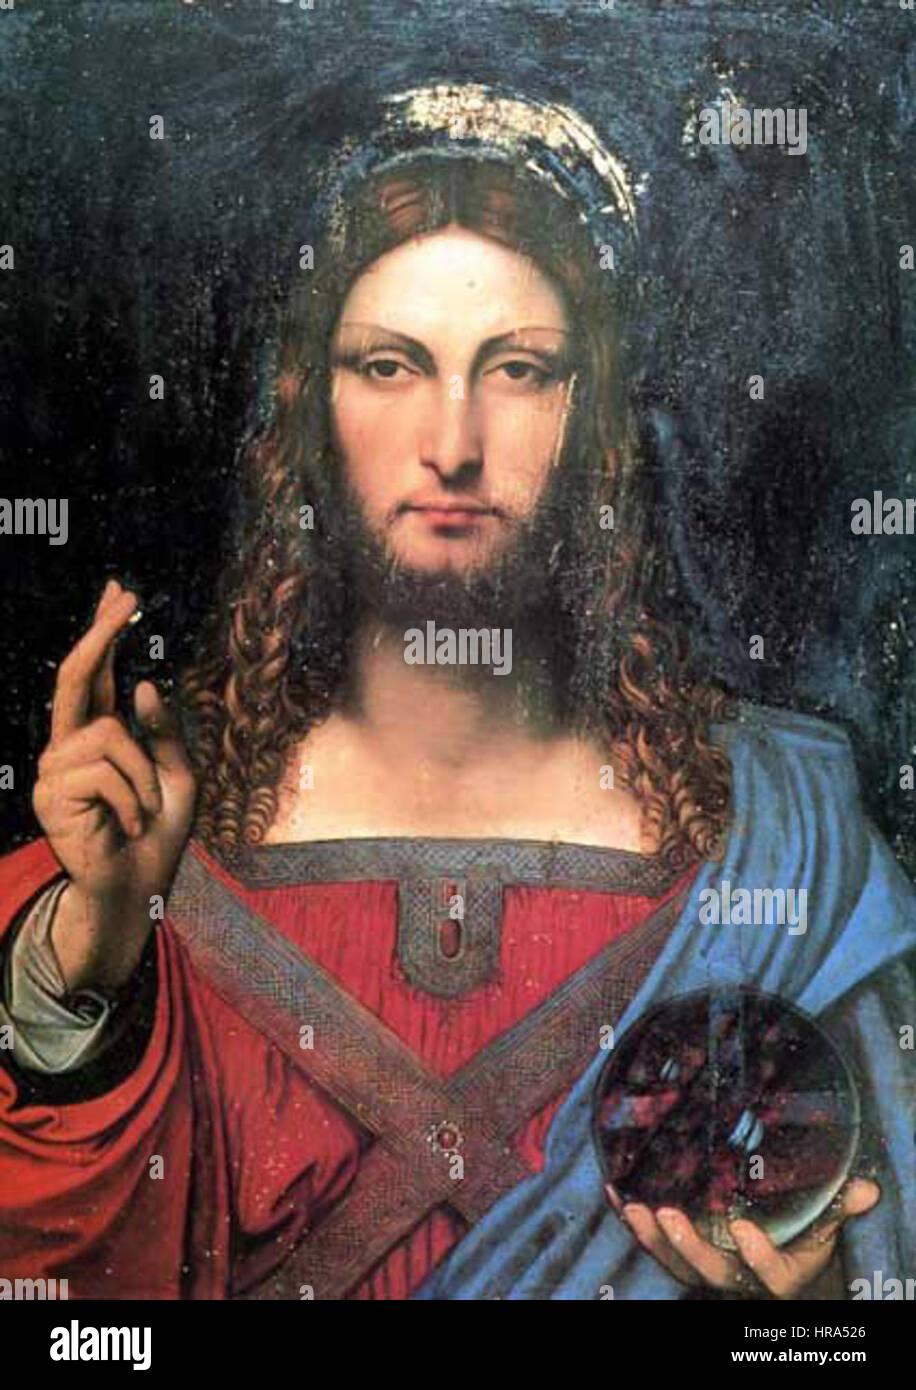 Salvator Mundi Ganay >> Salvator Mundi Ganay Stock Photo 134833166 Alamy